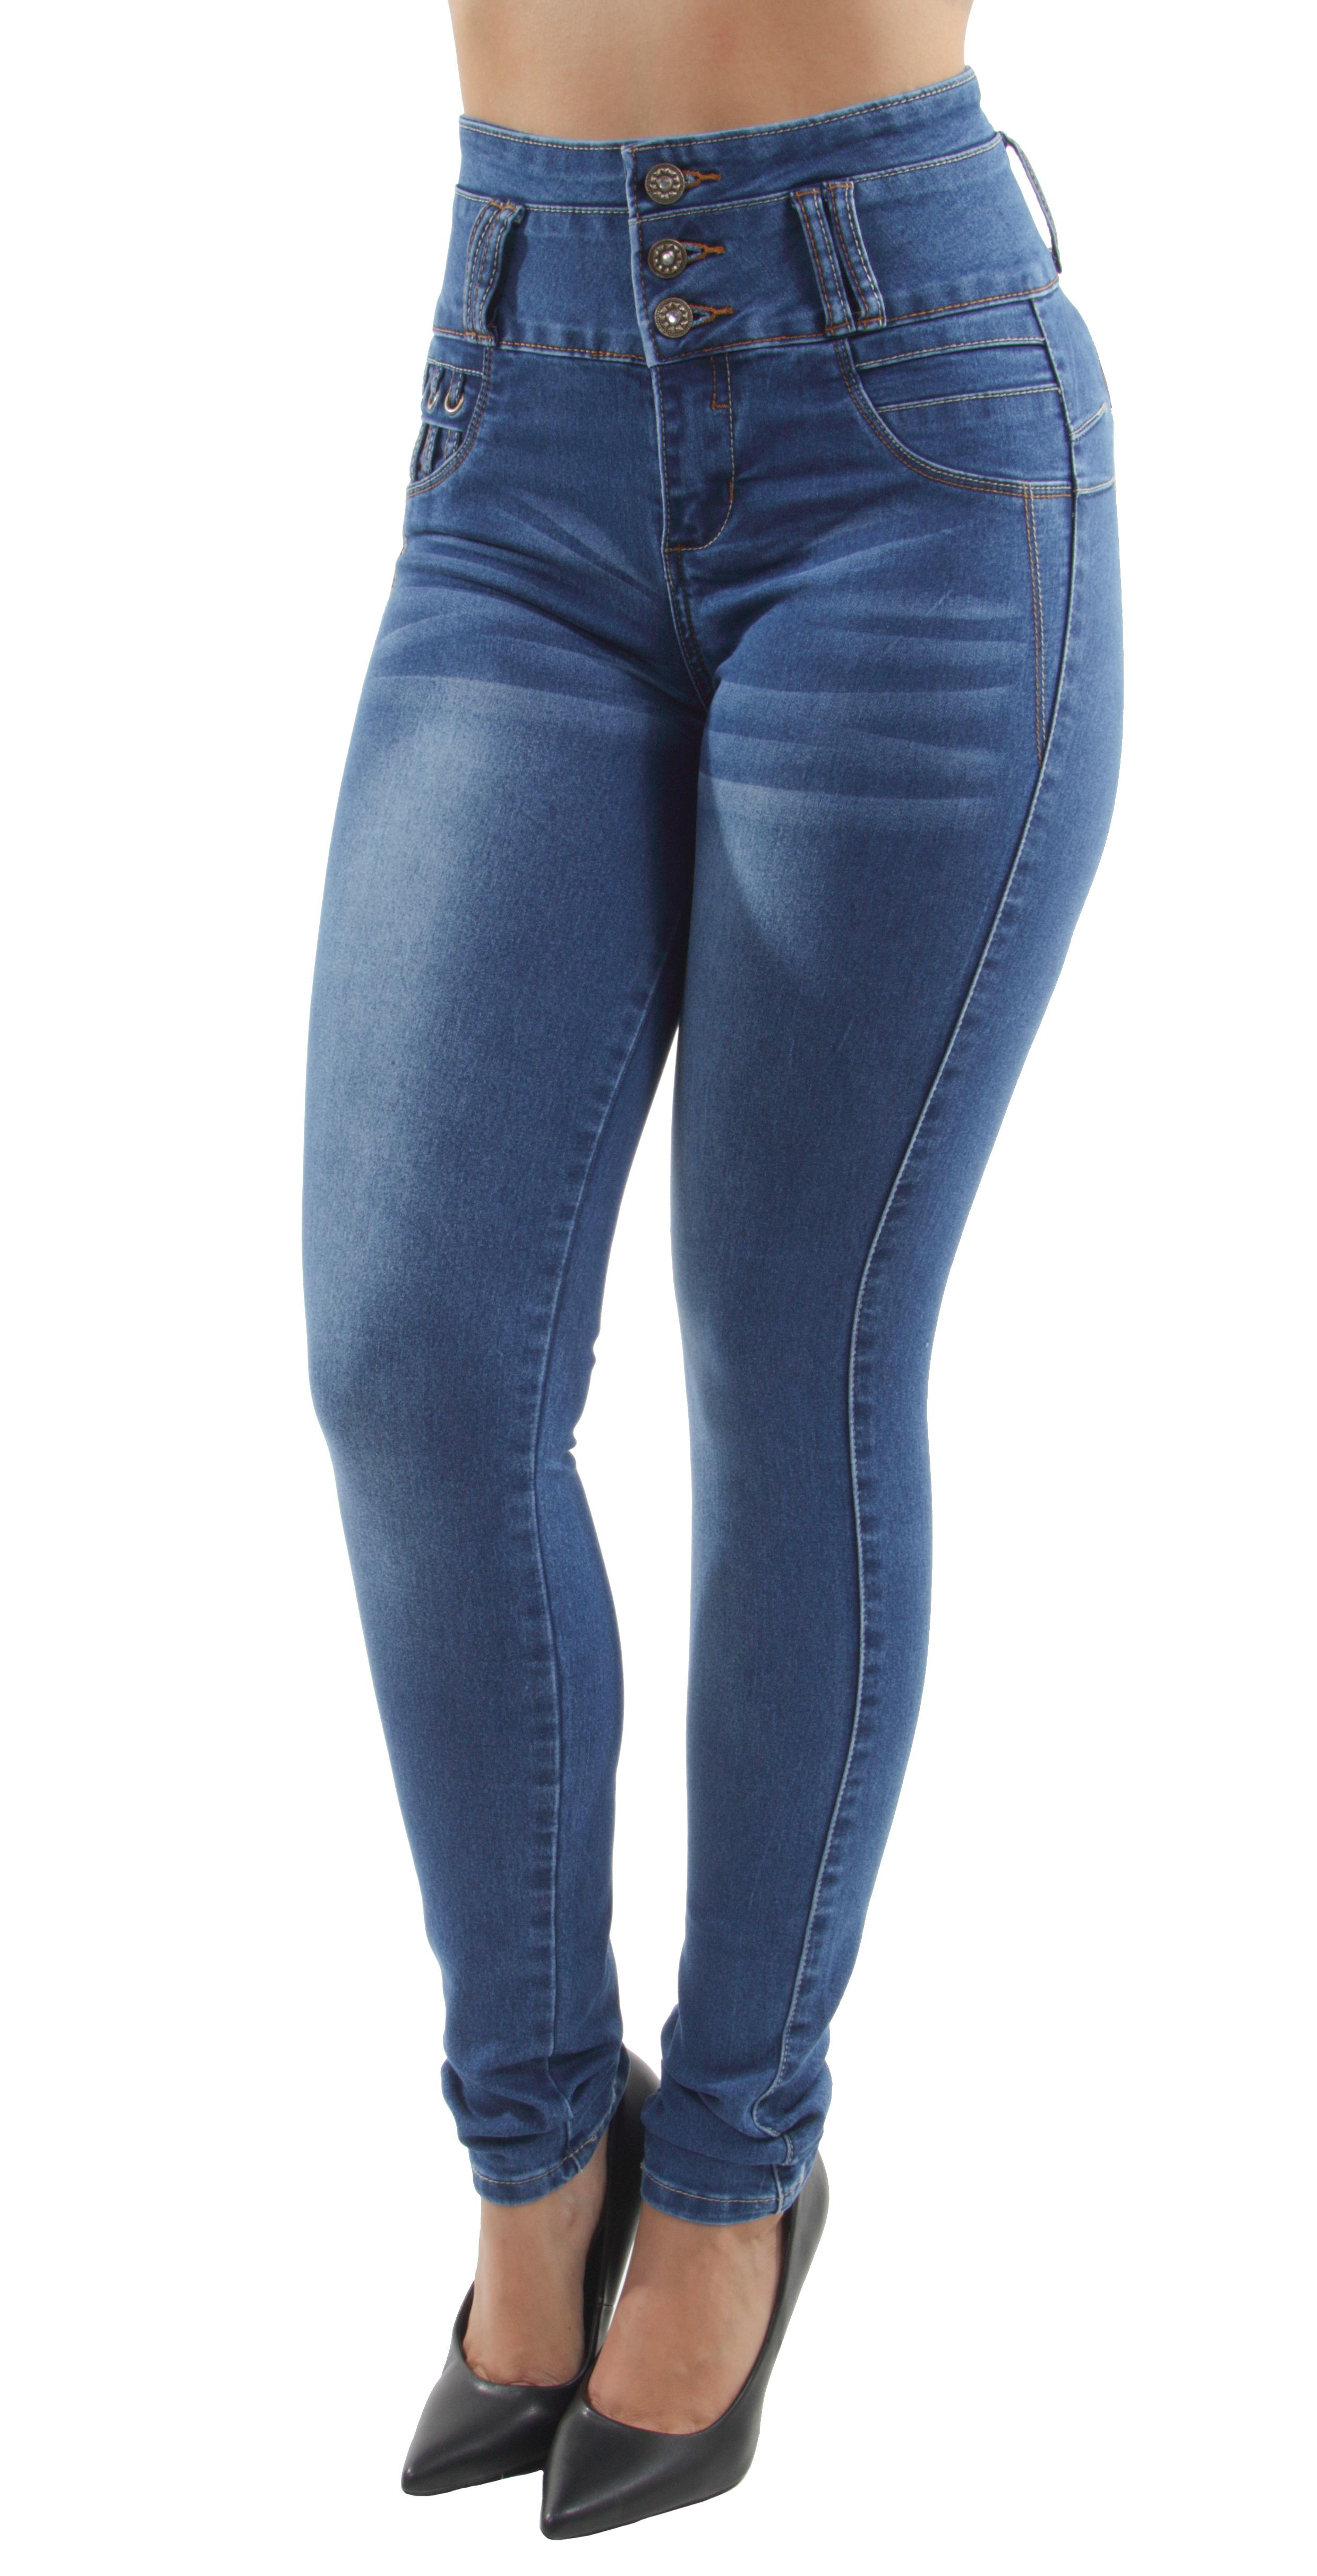 High Waist Push Up Butt Lift Colombian Design Skinny Jeans